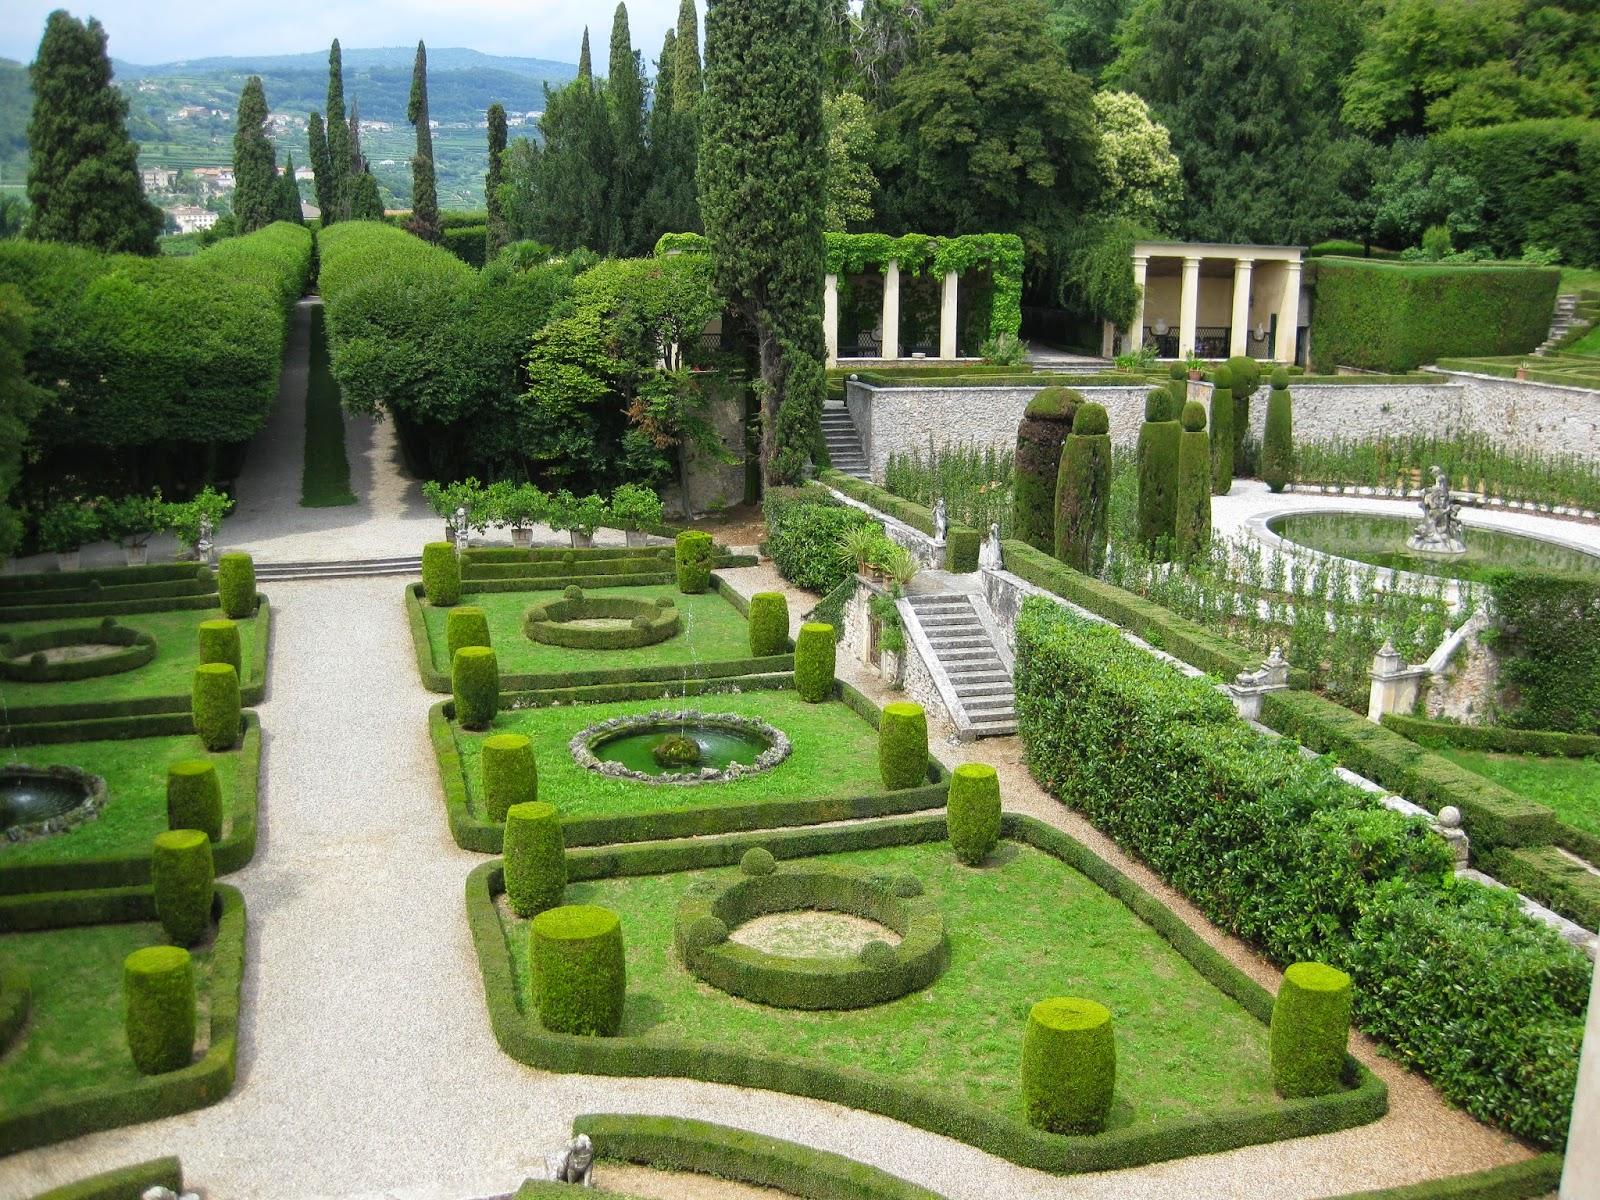 Ilclanmariapia il giardino di pojega - Viali da giardino ...